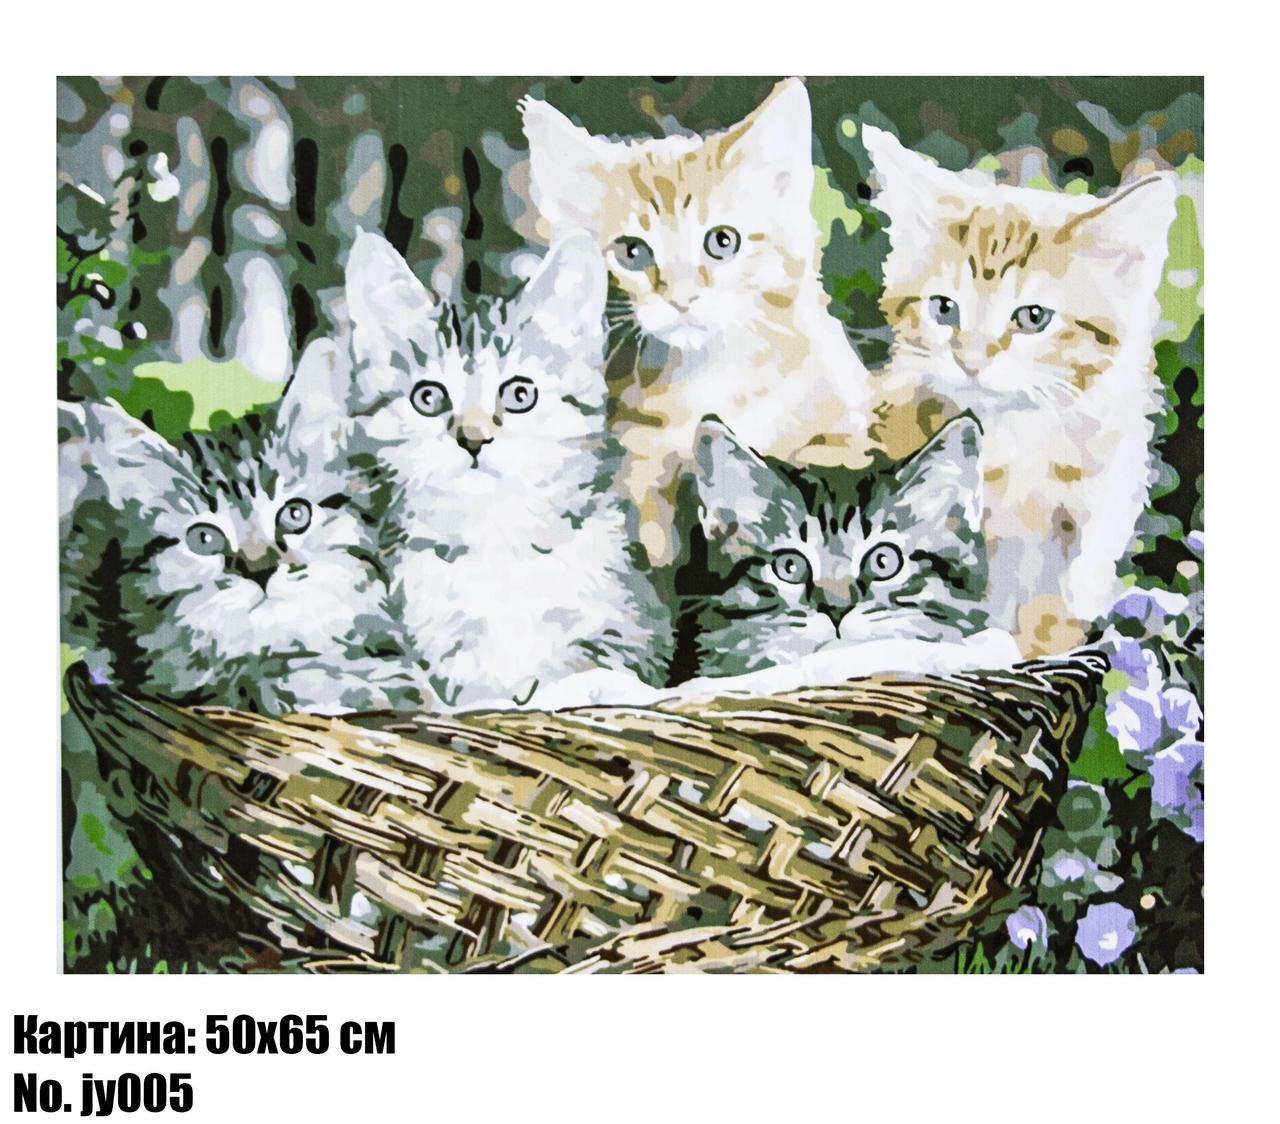 "Картина по номерам ""Котята"" размер 50 х 65 см, код JY005"